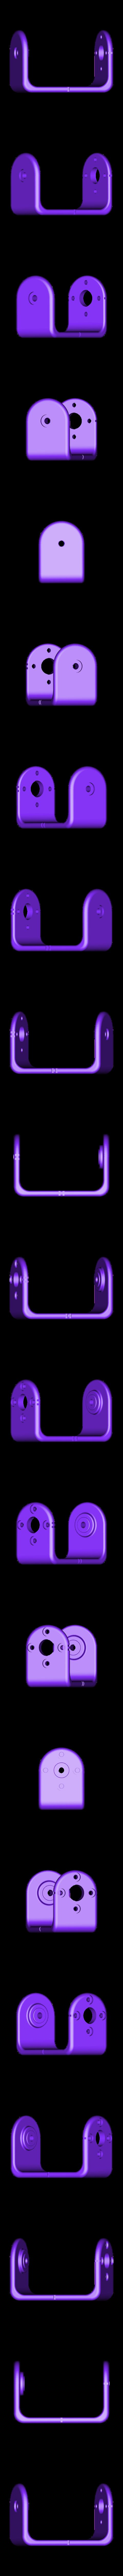 neck.STL Download free STL file Poppy Torso • 3D printable model, PoppyProject